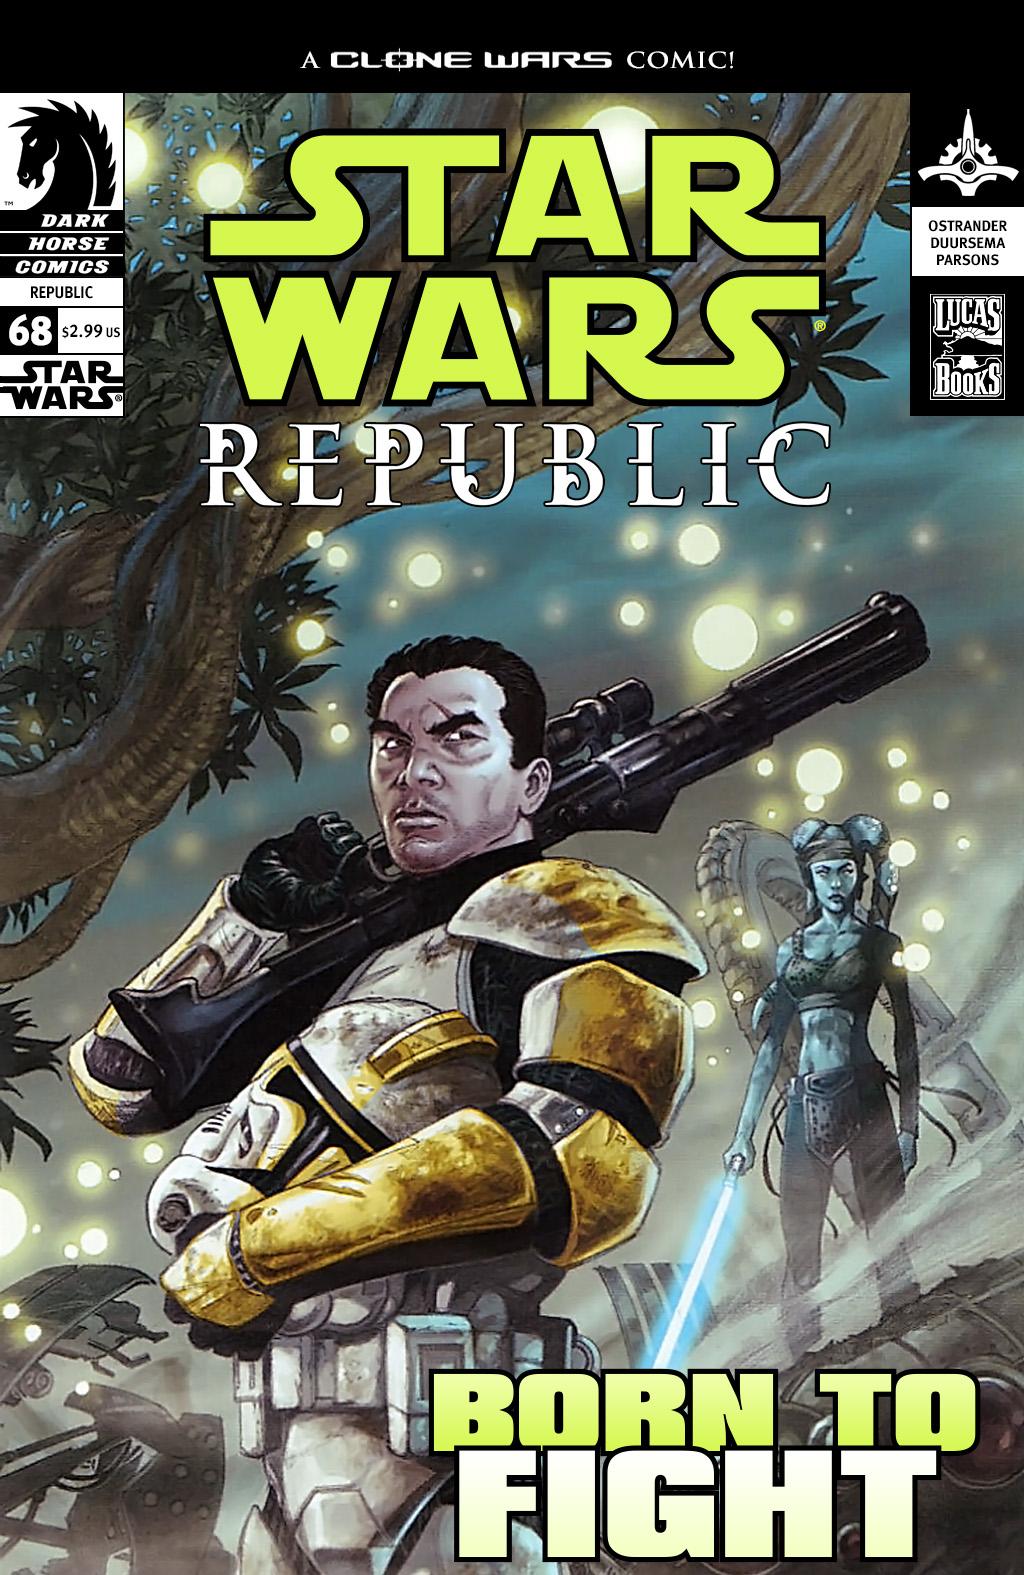 Star Wars: Republic 68 Page 1